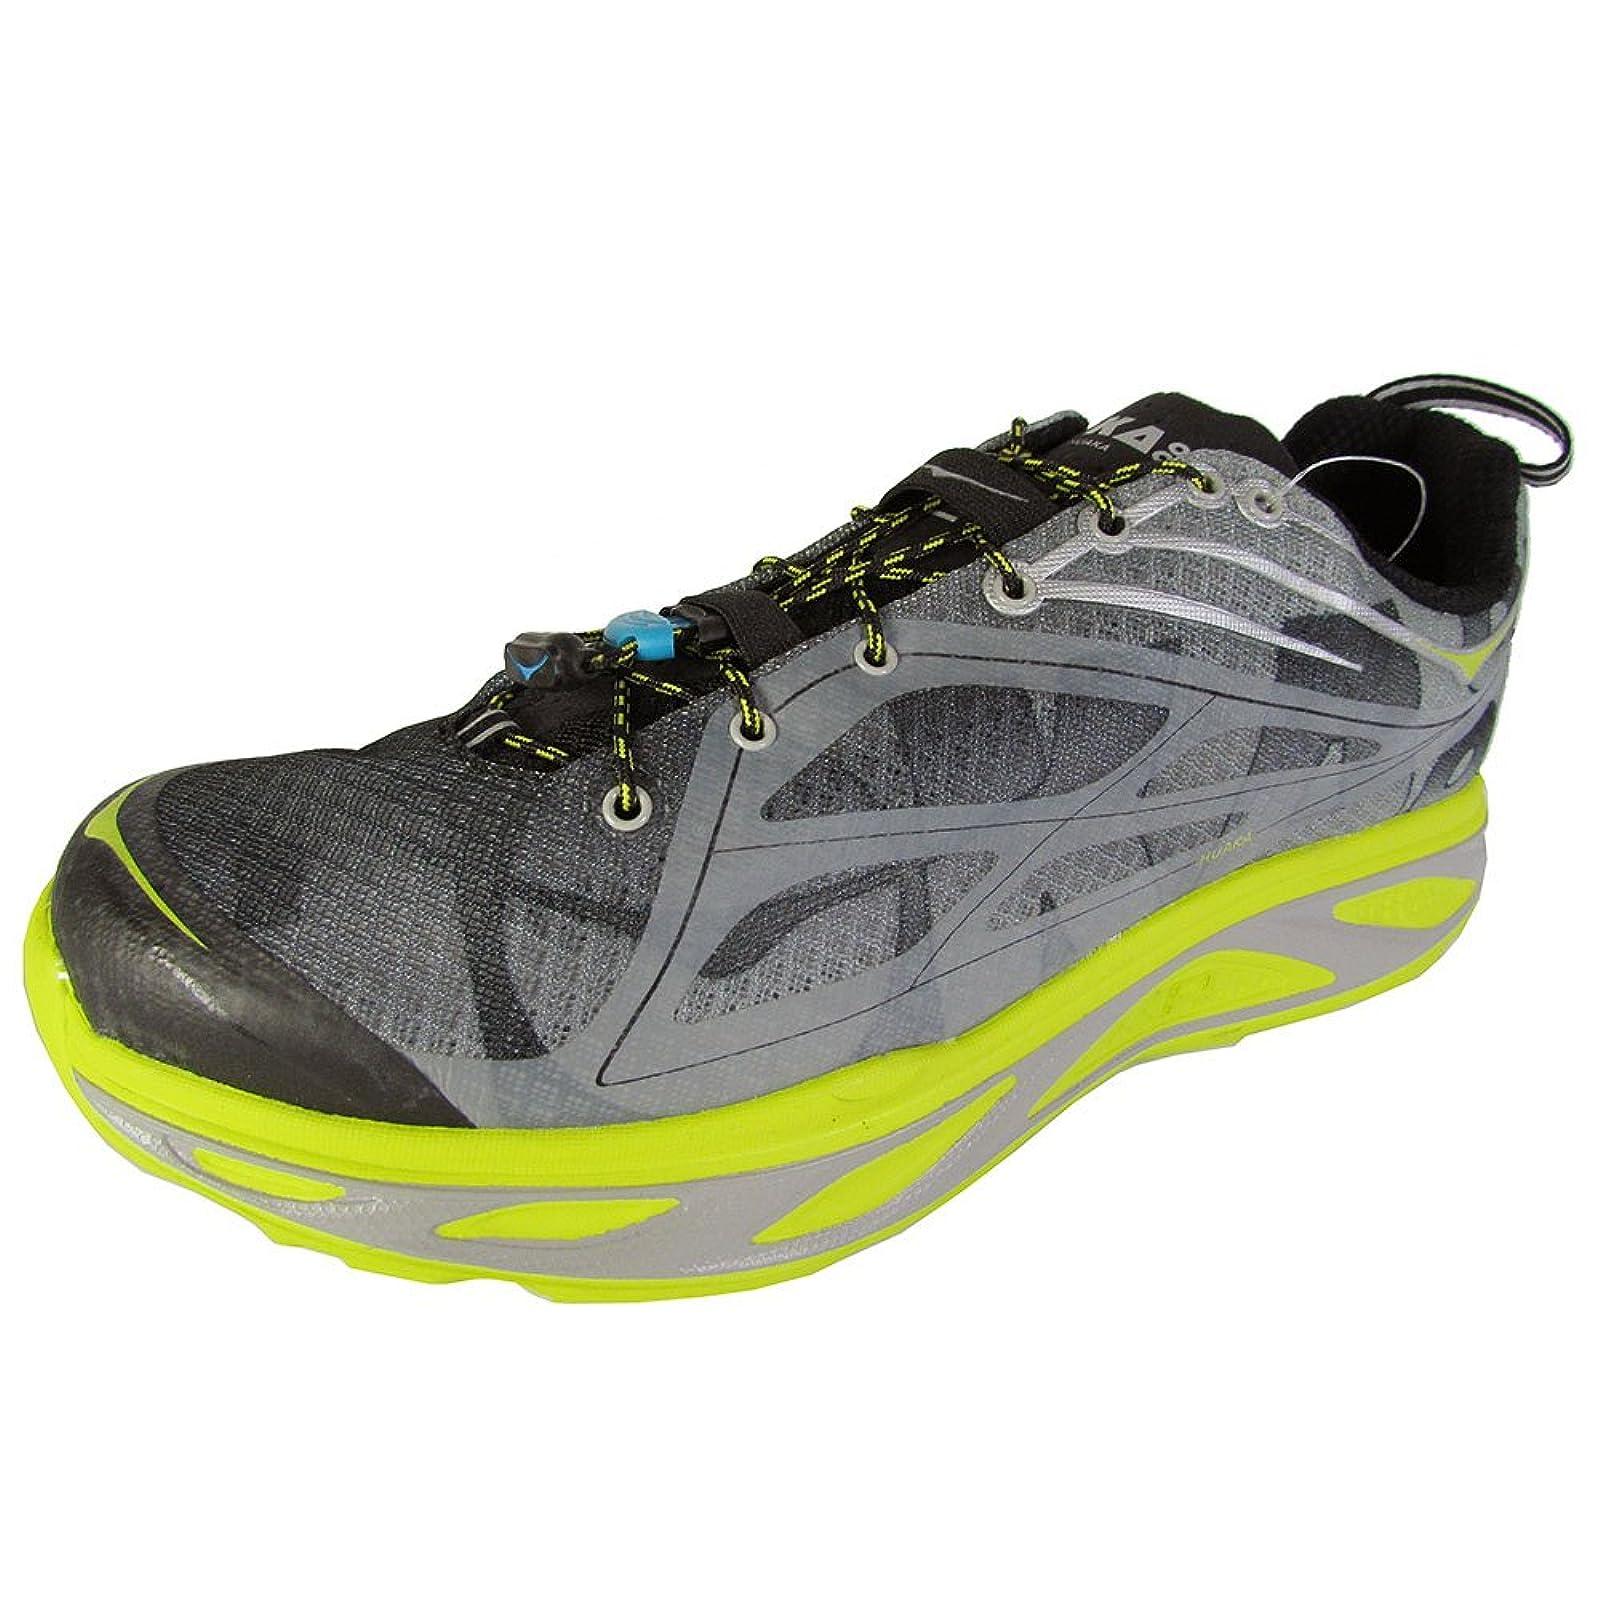 HOKA ONE ONE Mens Huaka Running Sneaker Shoe 8 M US - 5